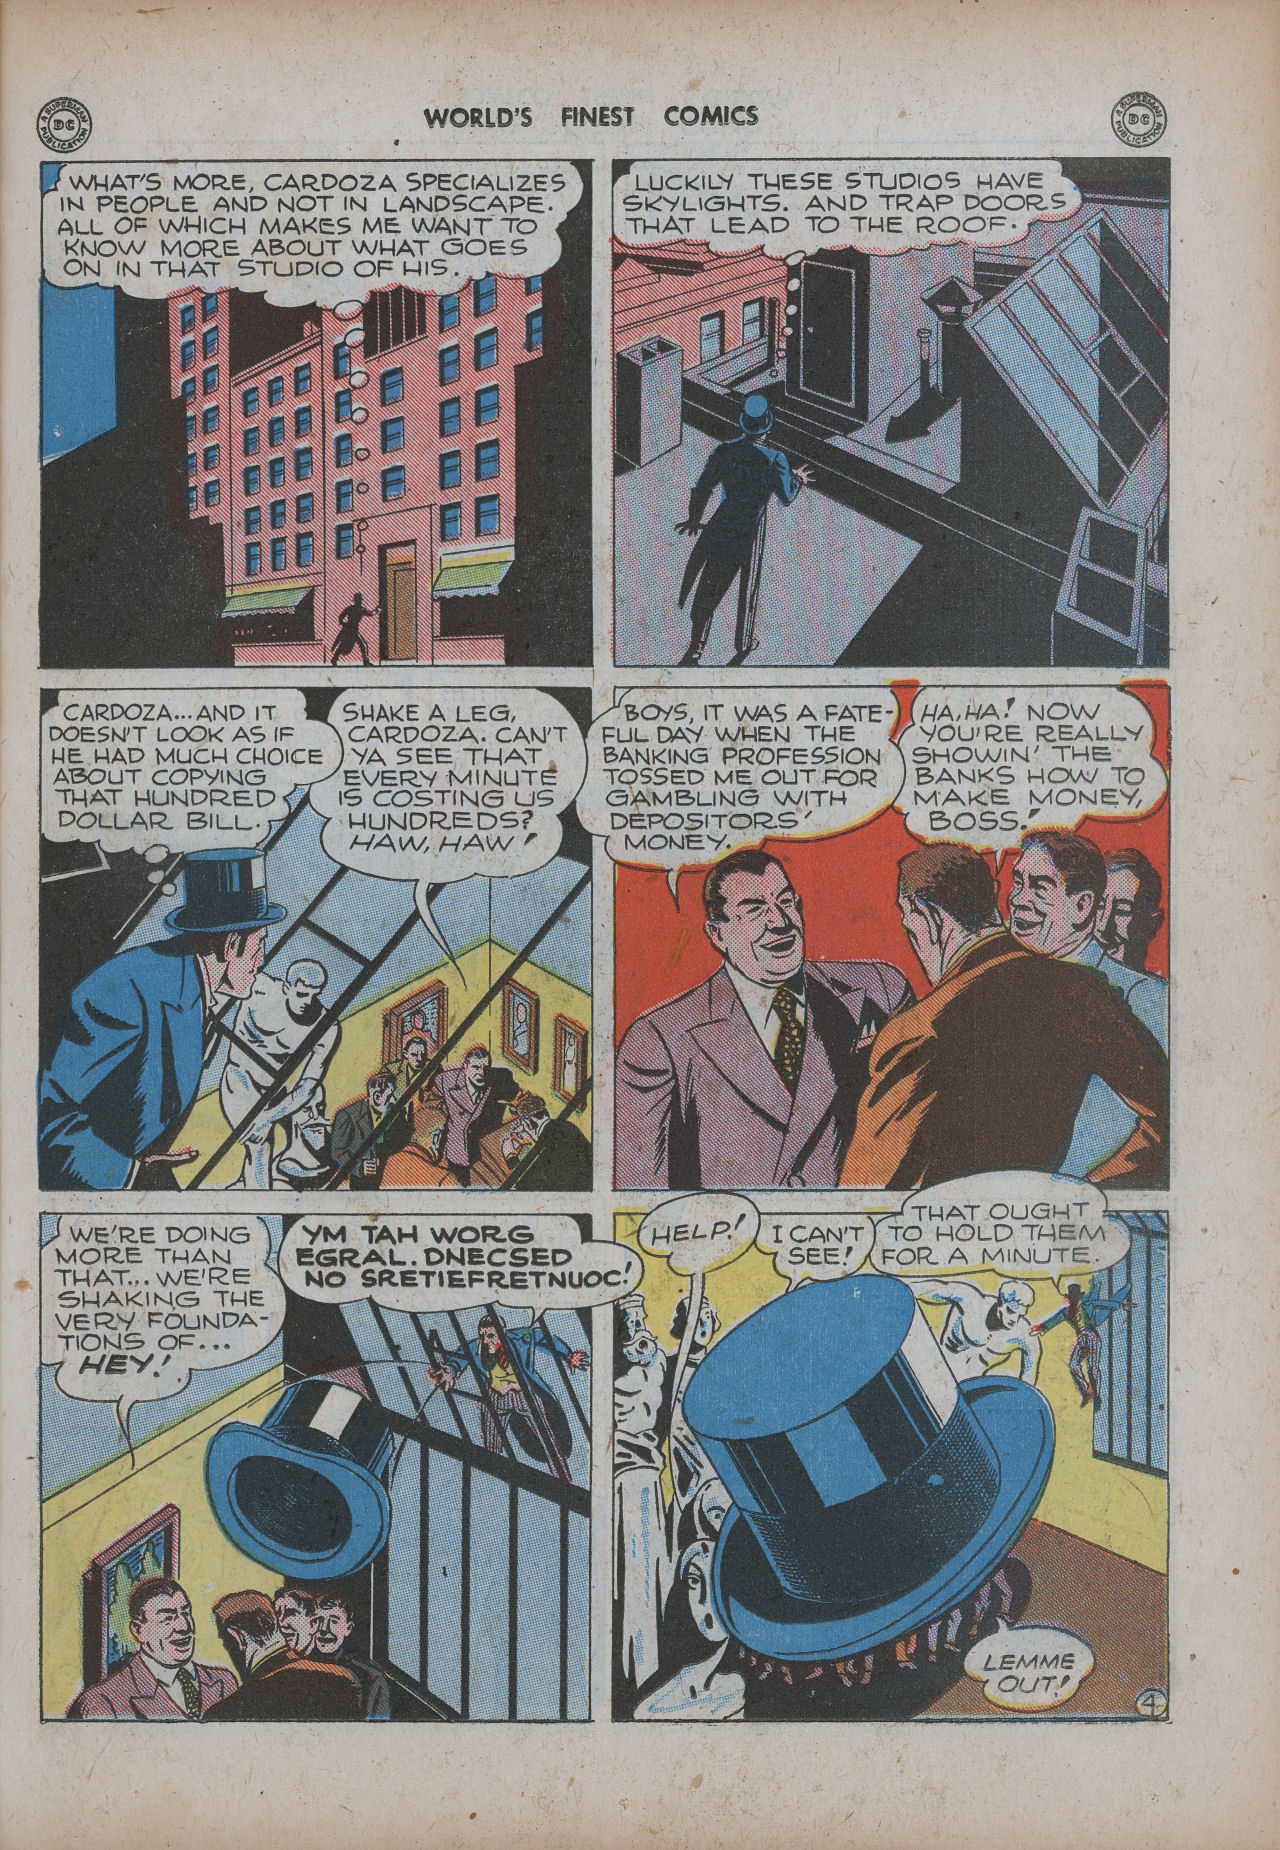 Read online World's Finest Comics comic -  Issue #20 - 31